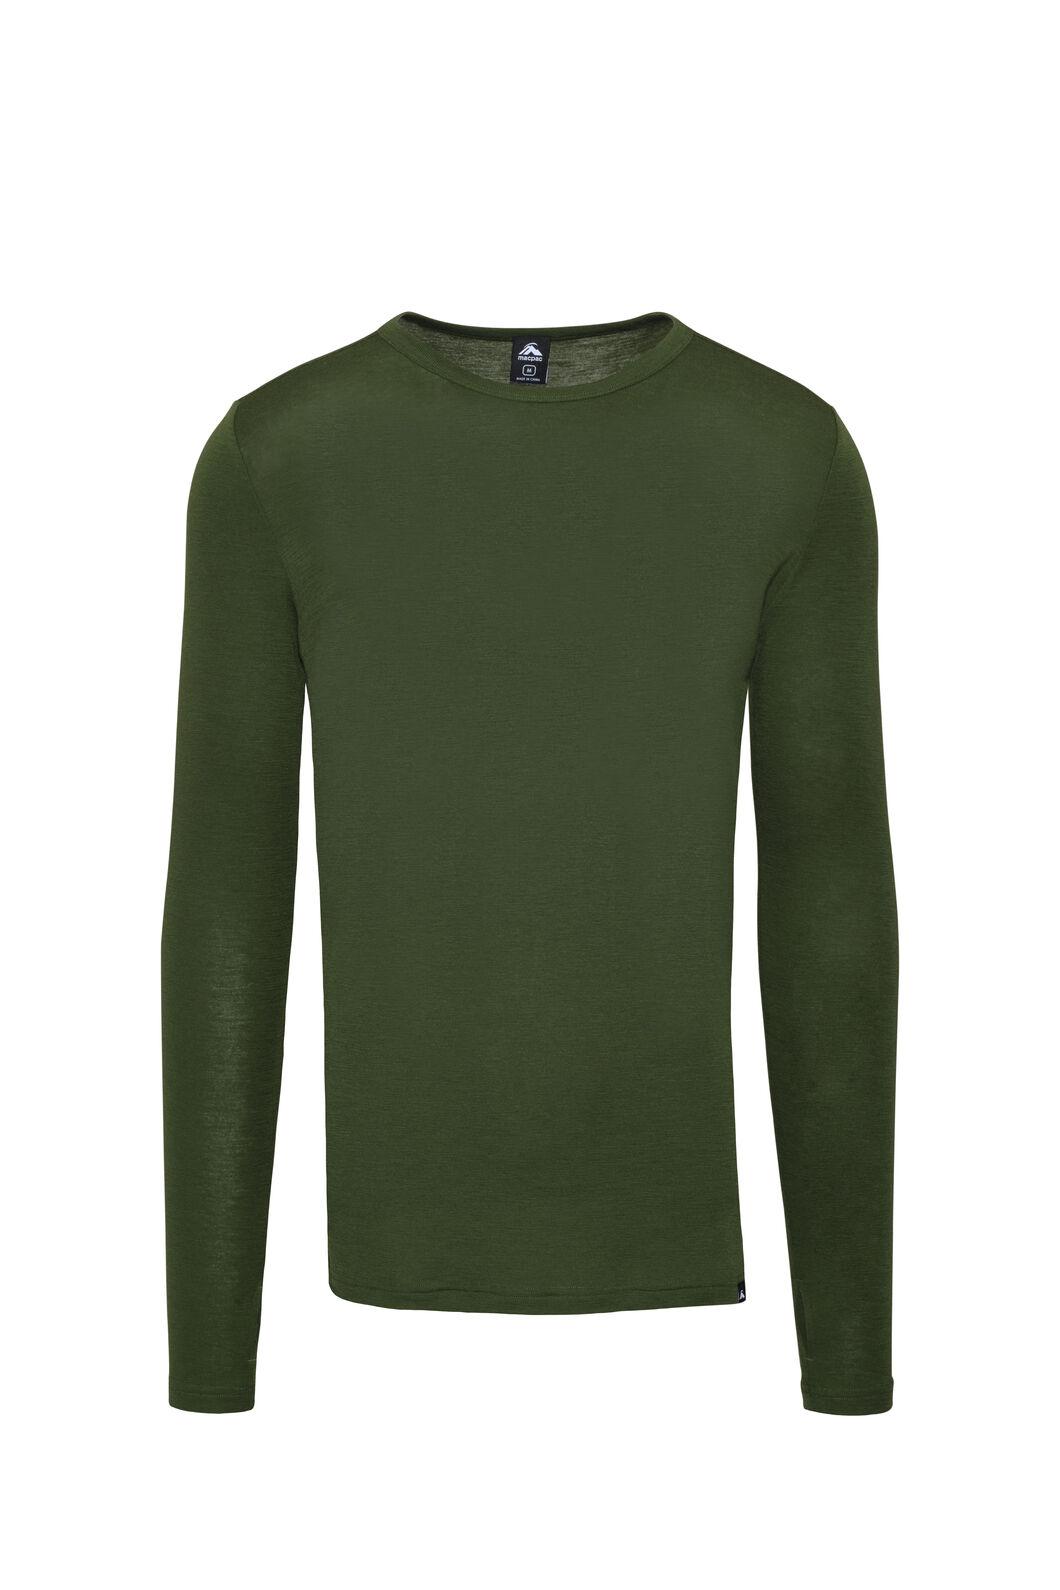 Macpac 220 Merino Long Sleeve Top — Men's, Chive, hi-res